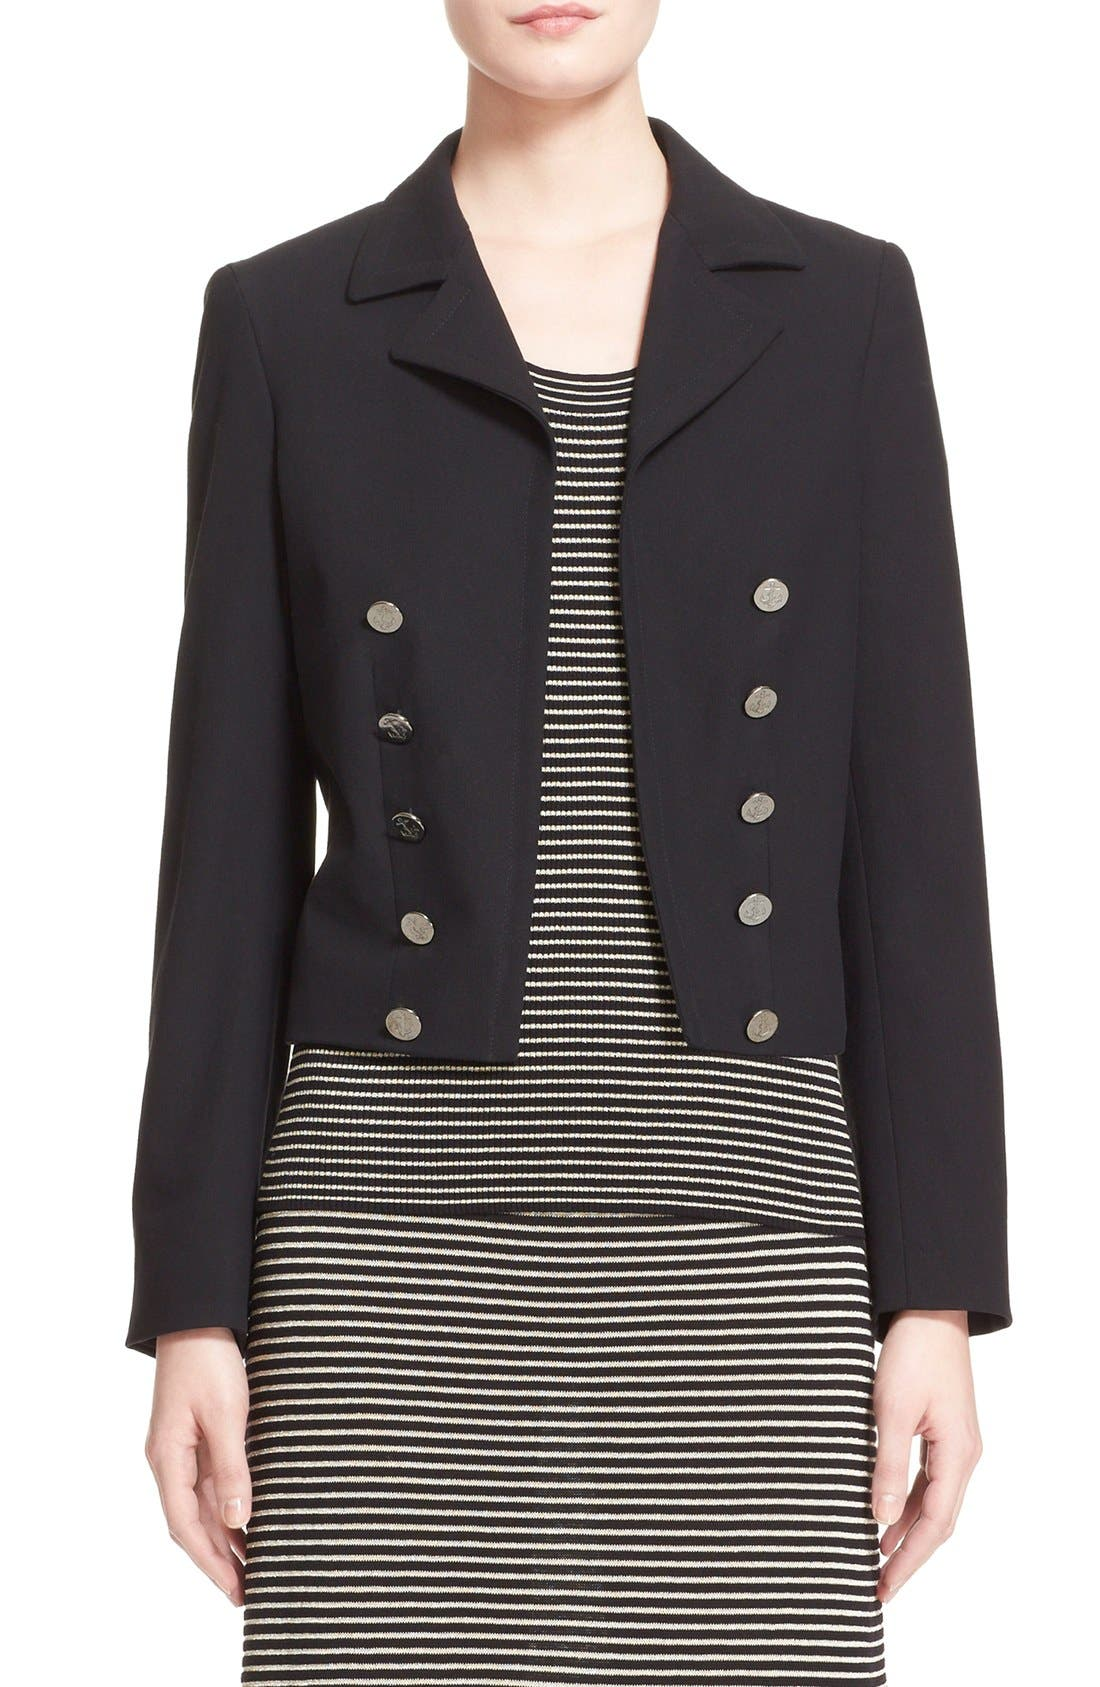 Alternate Image 1 Selected - Max Mara 'Talpa' Stretch Cotton & Linen Jacket